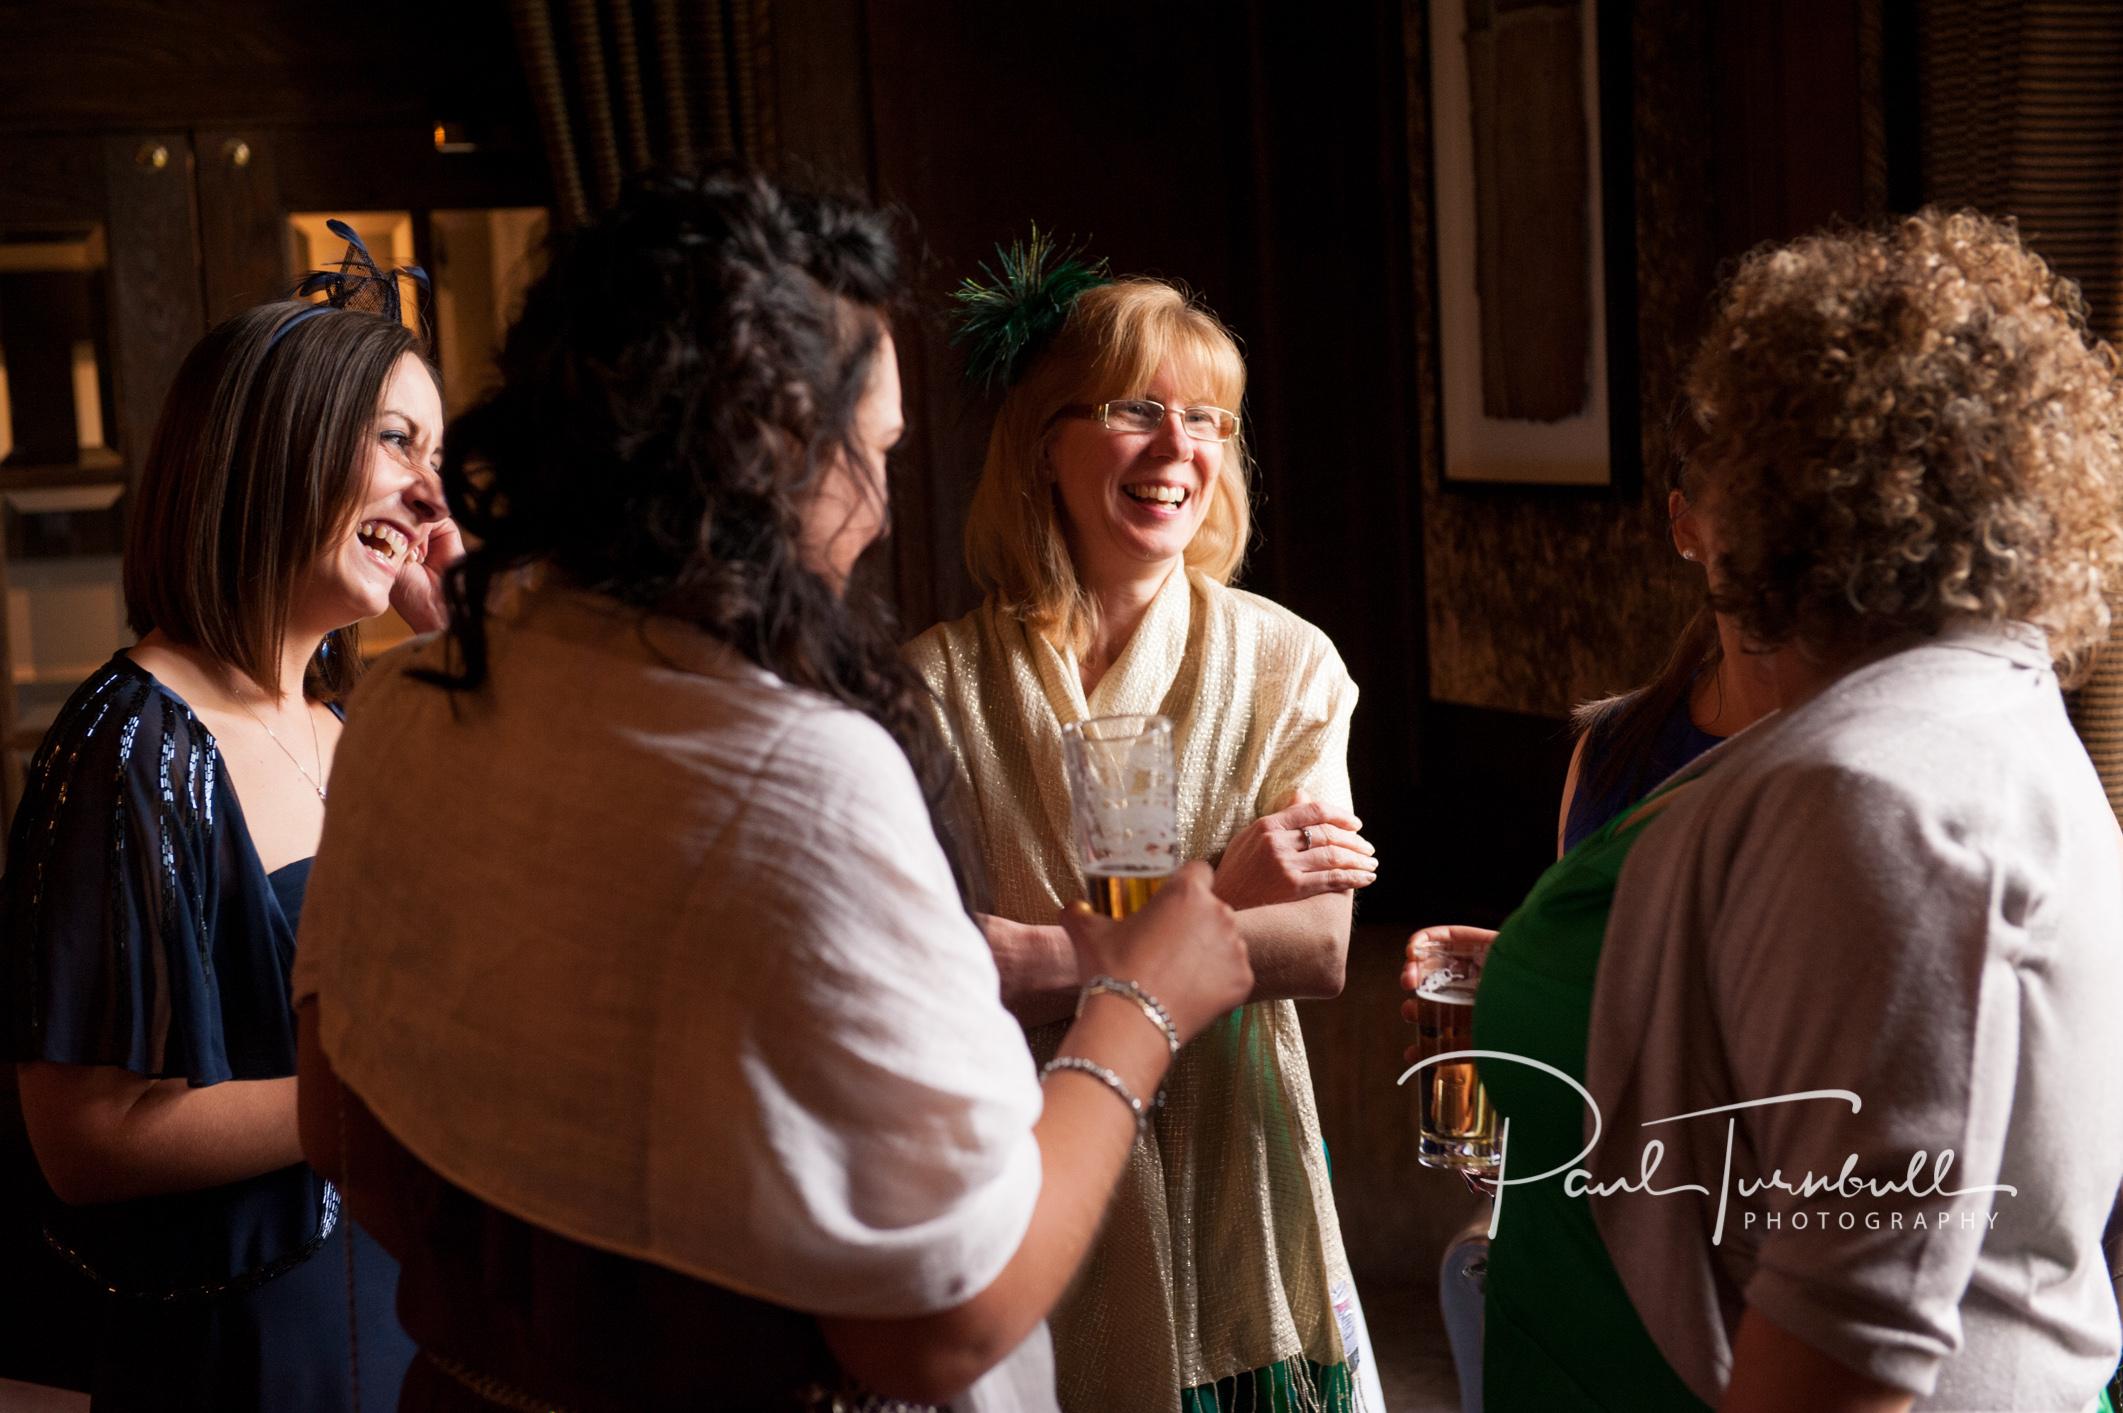 wedding-photography-wood-hall-wetherby-yorkshire-016.jpg